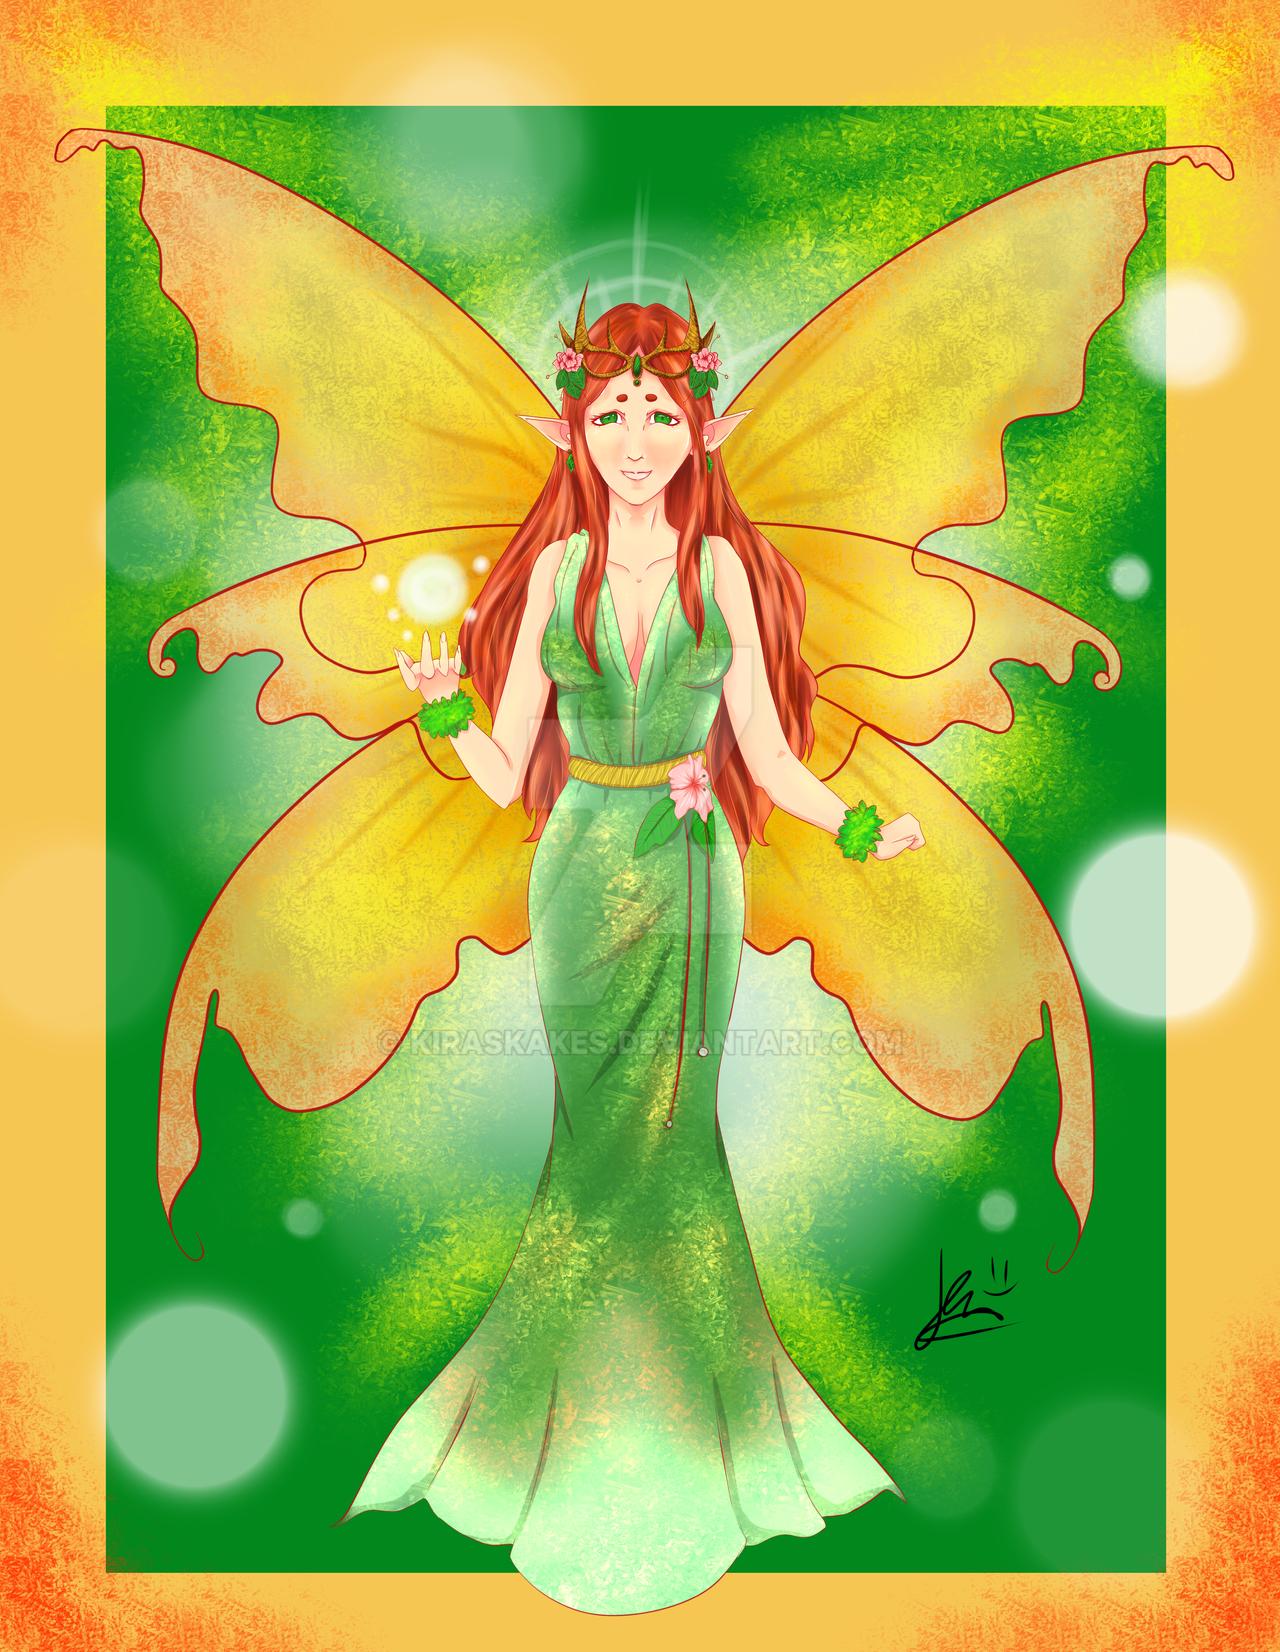 Earth Fairy Queen by KirasKakes on DeviantArt